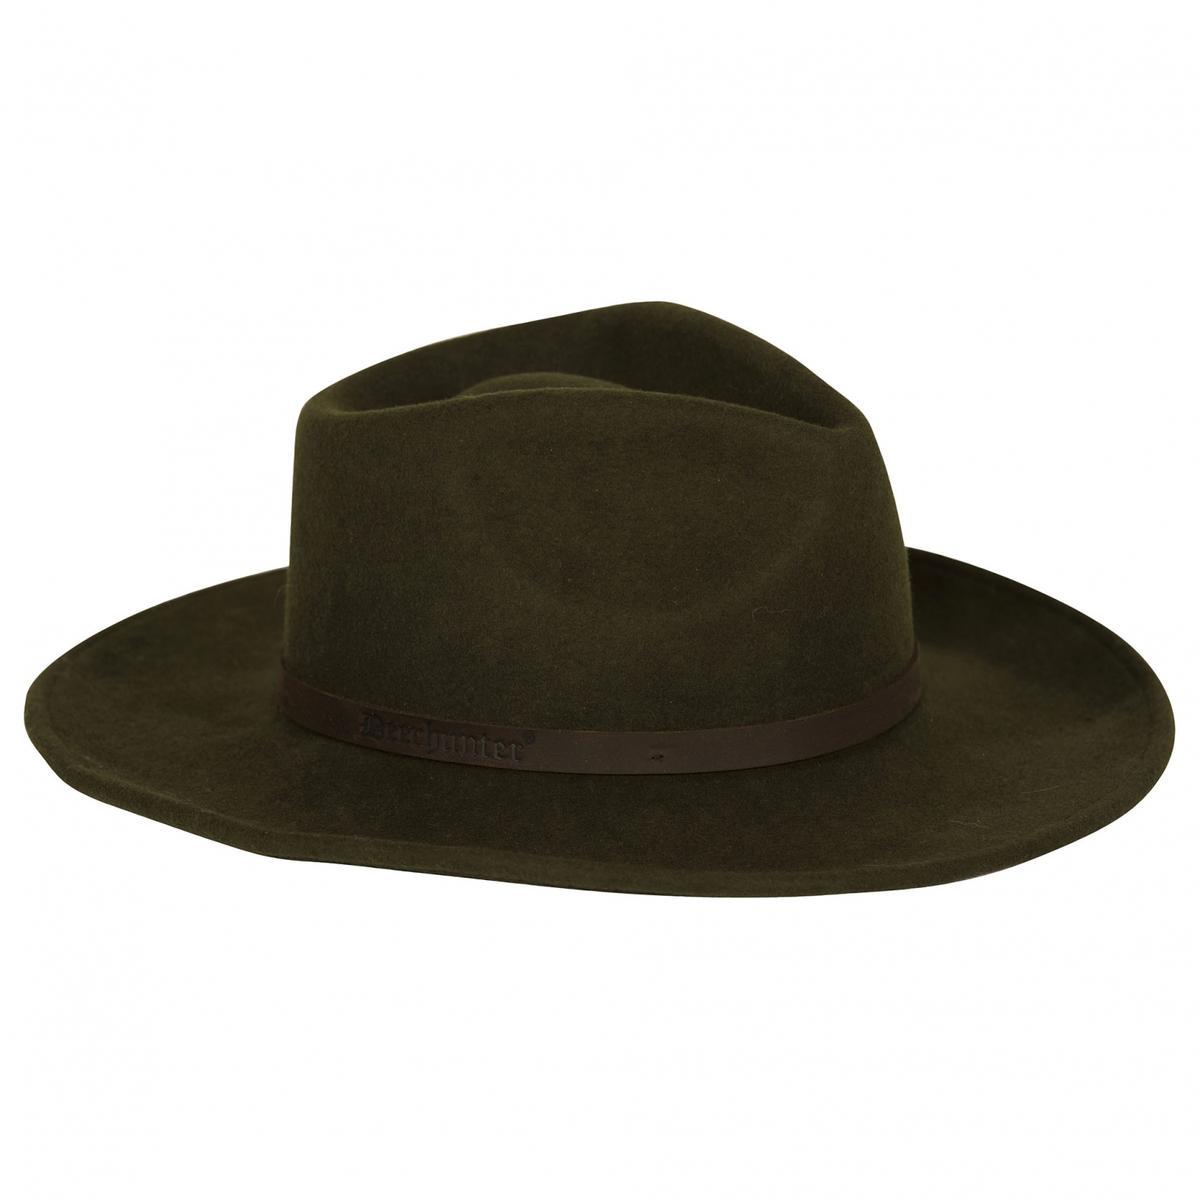 Felt Green Hat Deerhunter Ranger Ranger Deerhunter Felt SZwIAYqT